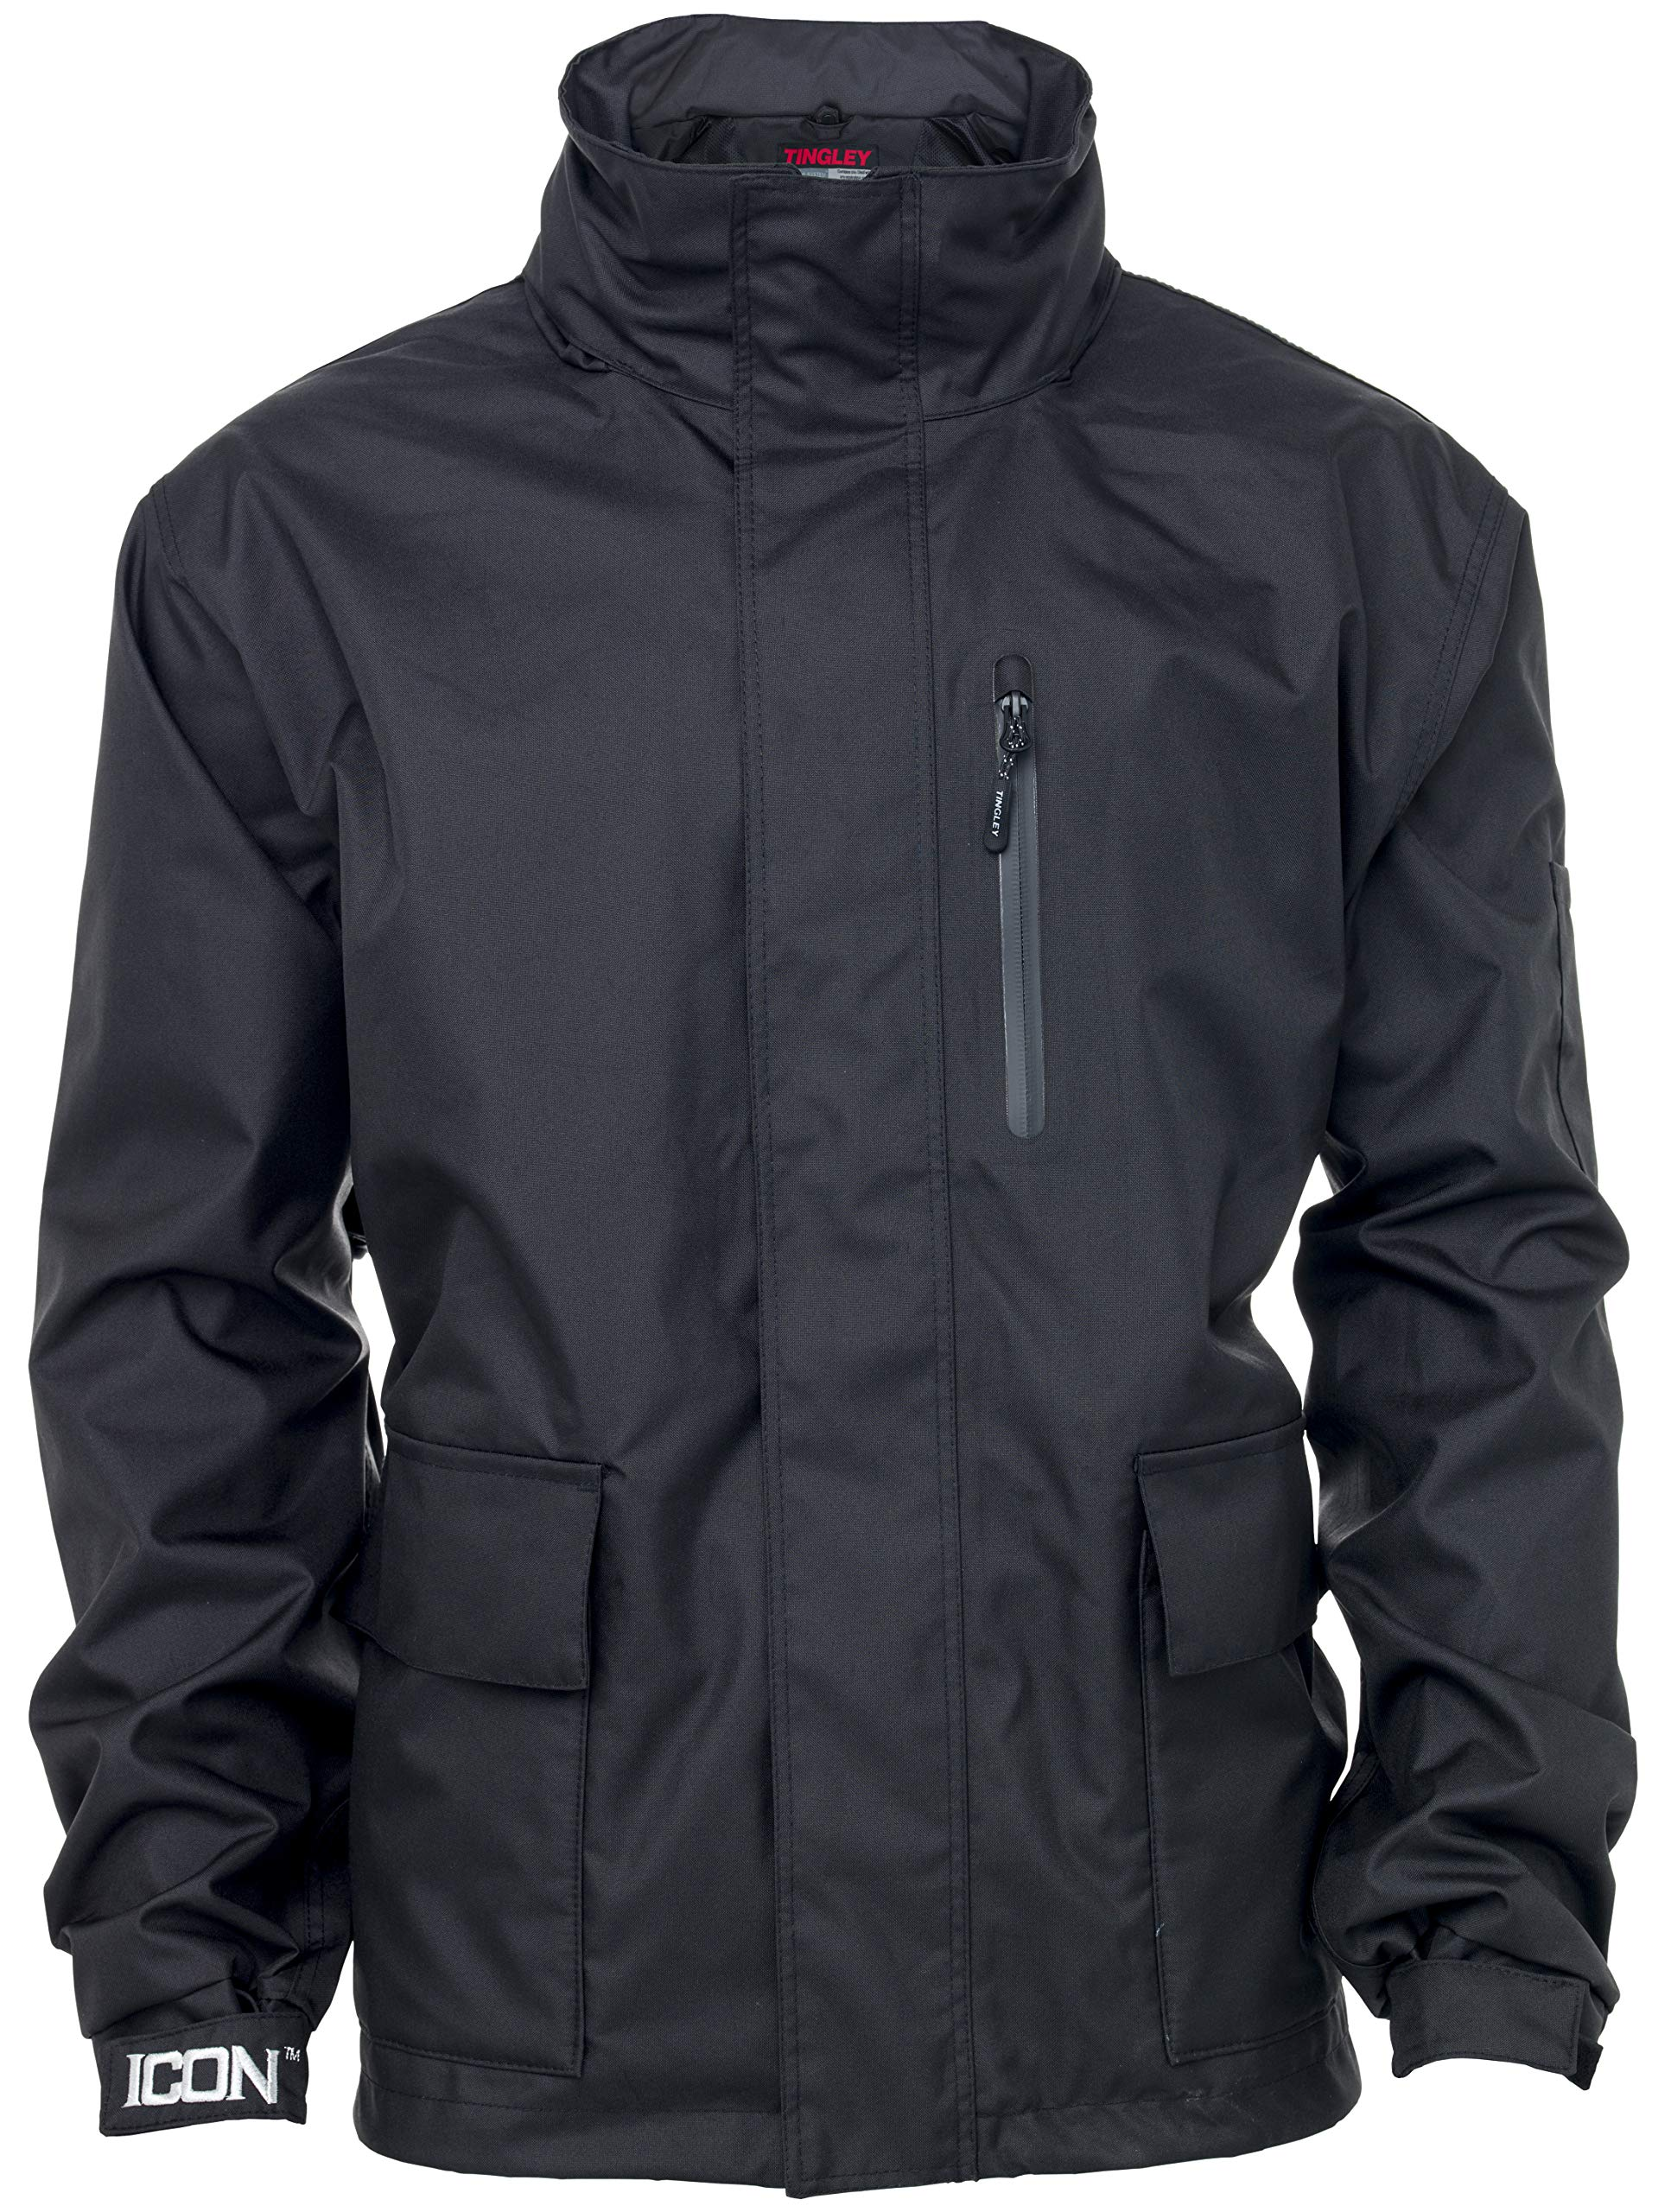 TINGLEY Rubber J24113.XL Premium Waterproof Breathable Jacket